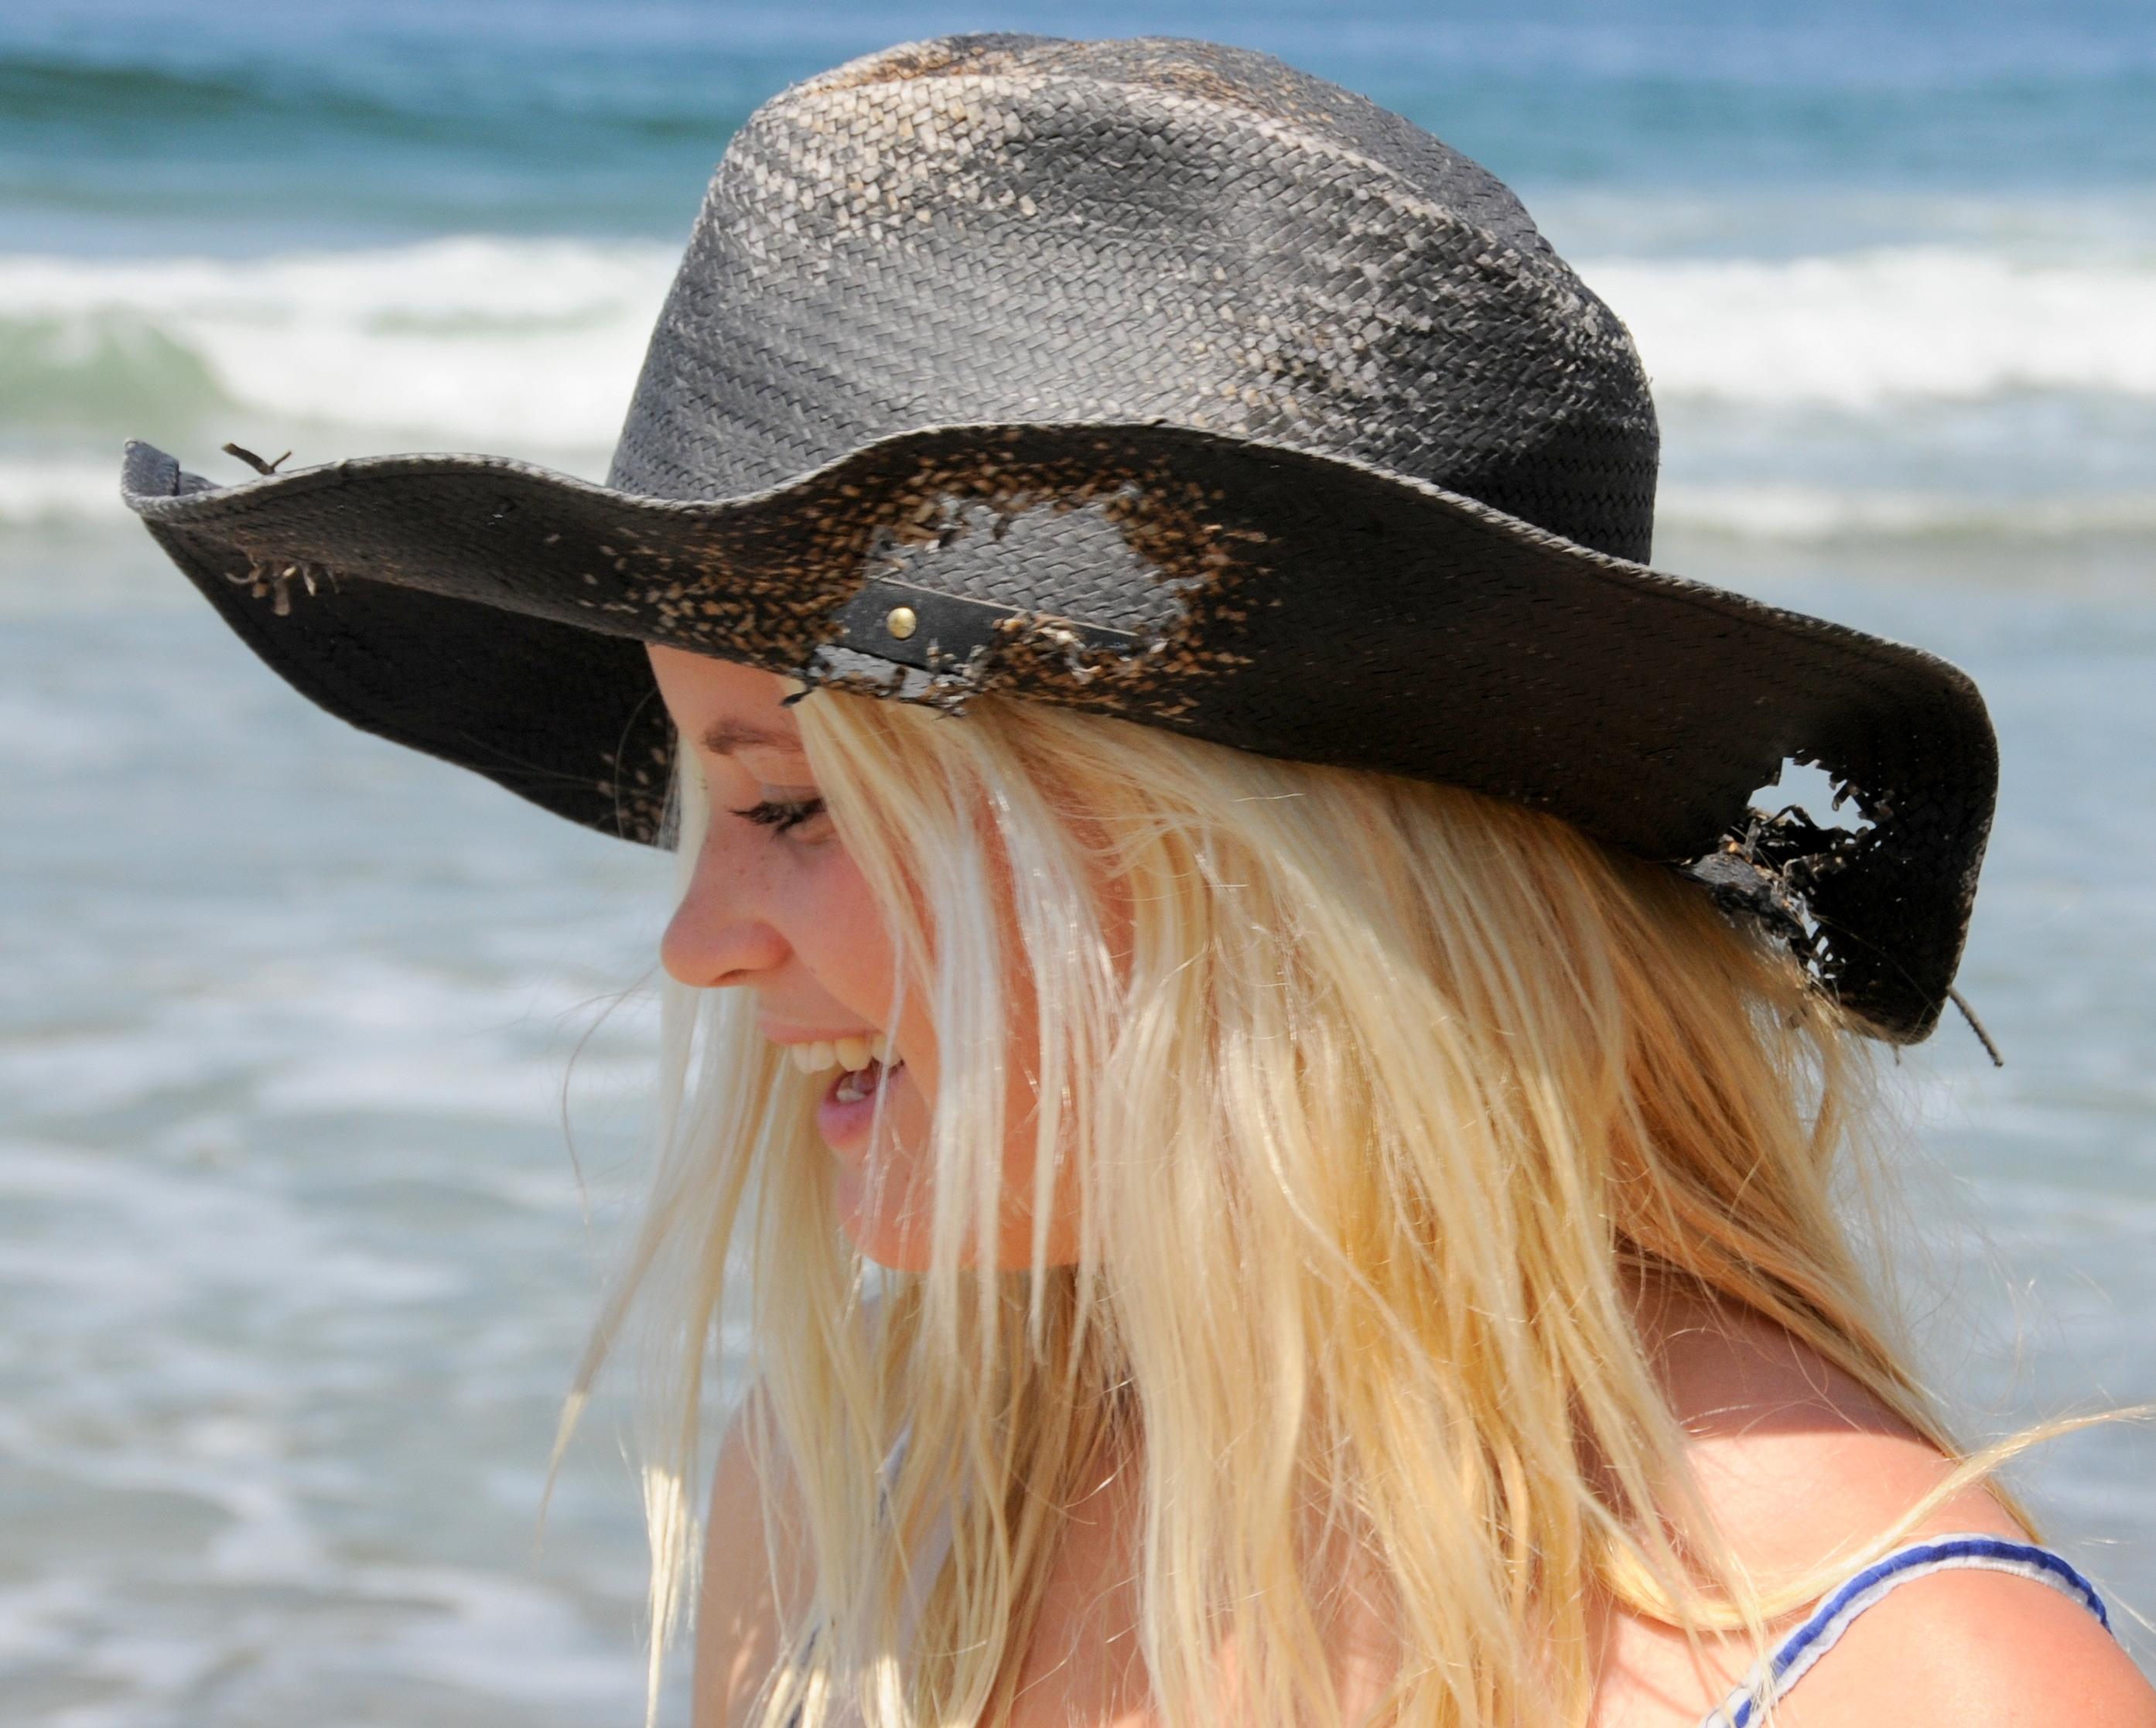 Chicas rubias con sombreros - 2787x2234